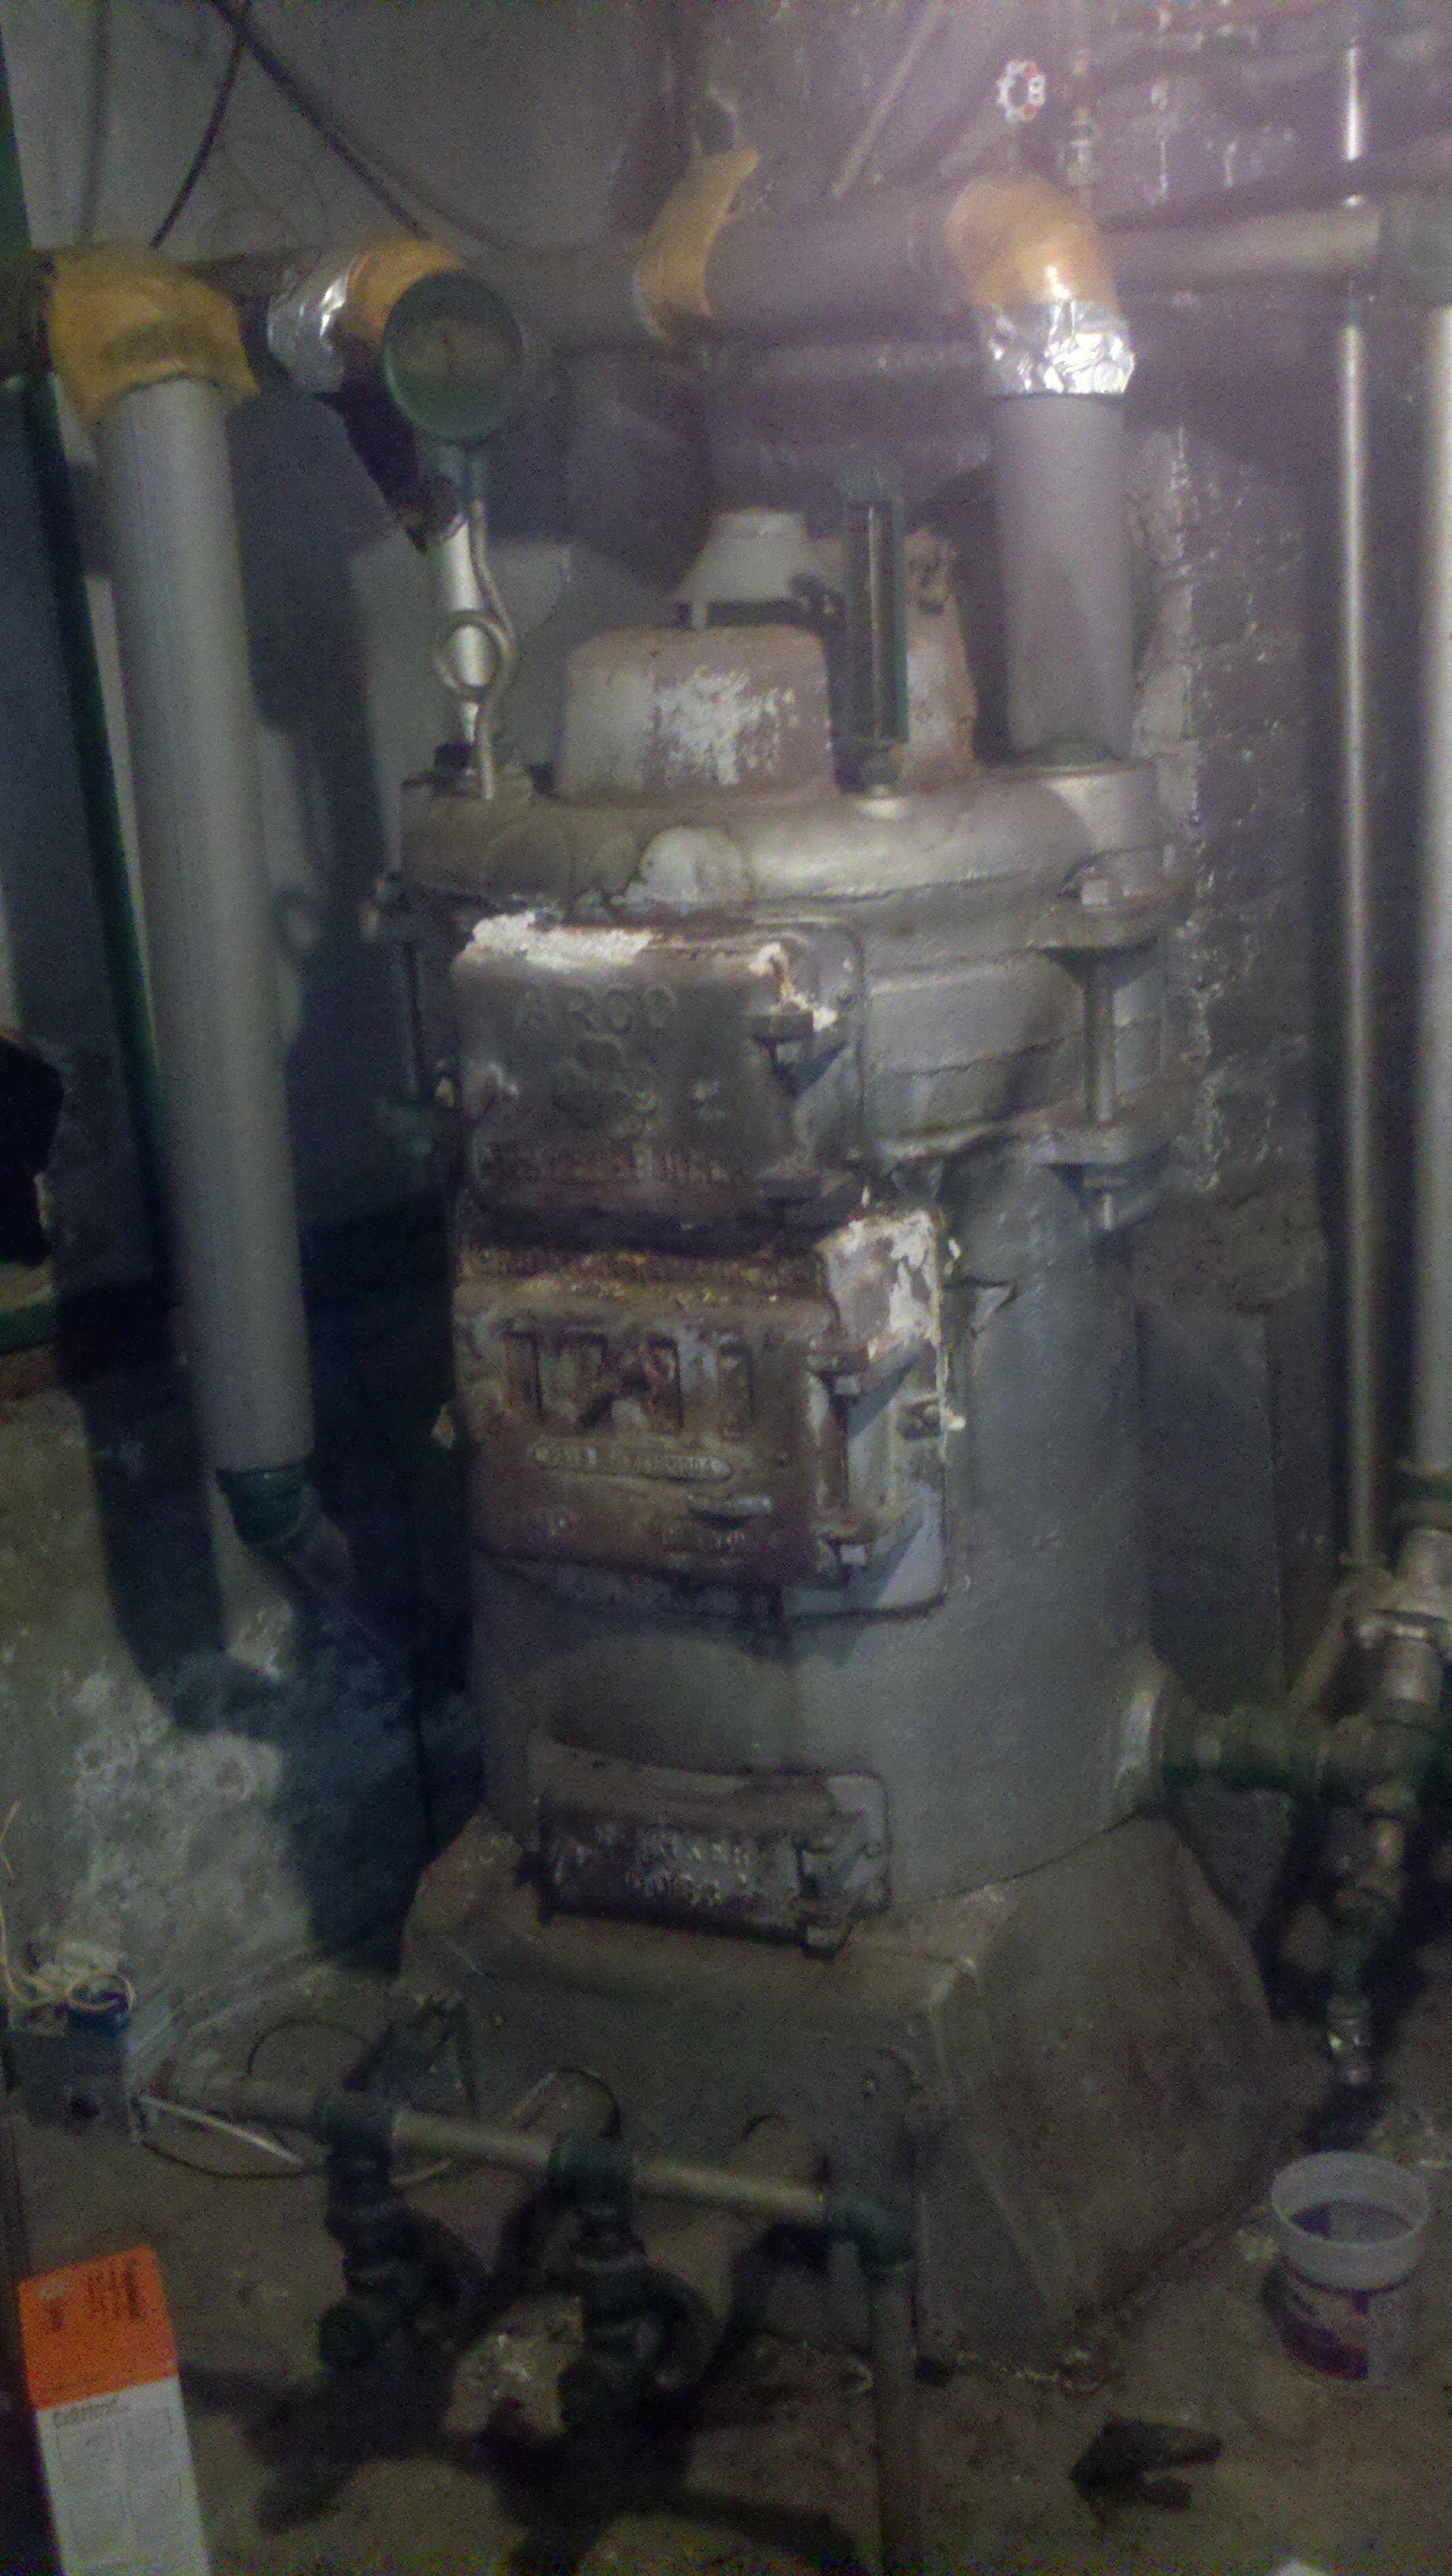 Antique Coal Boiler Monster In The Basement